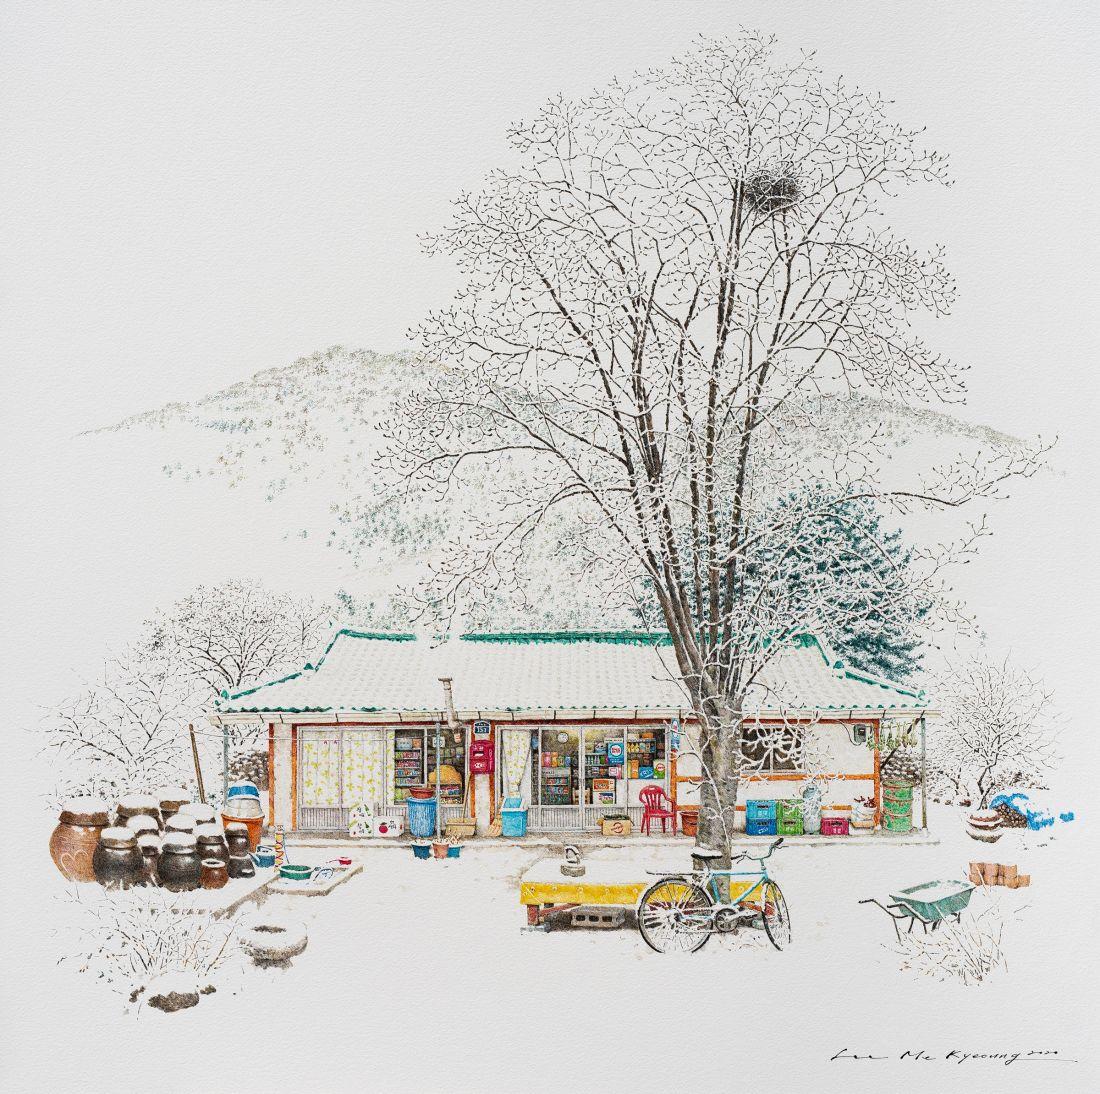 Musim dingin di Toji, 2020 © Me Kyeoung Lee